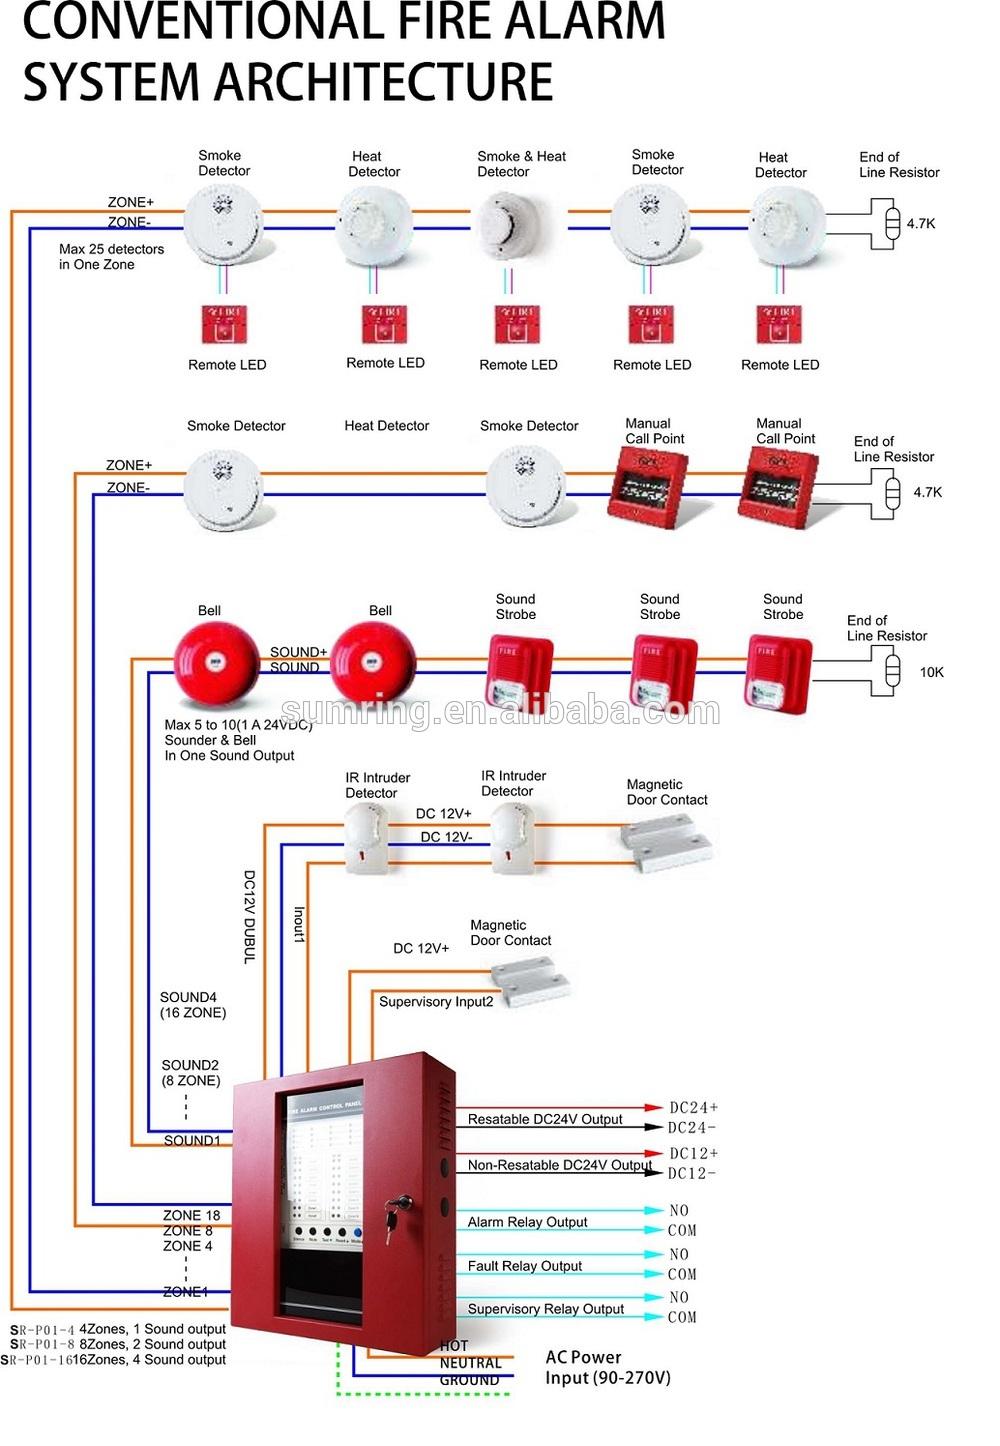 Horn Strobe Wiring Diagram - Coreyj.co • - Fire Alarm Horn Strobe Wiring Diagram